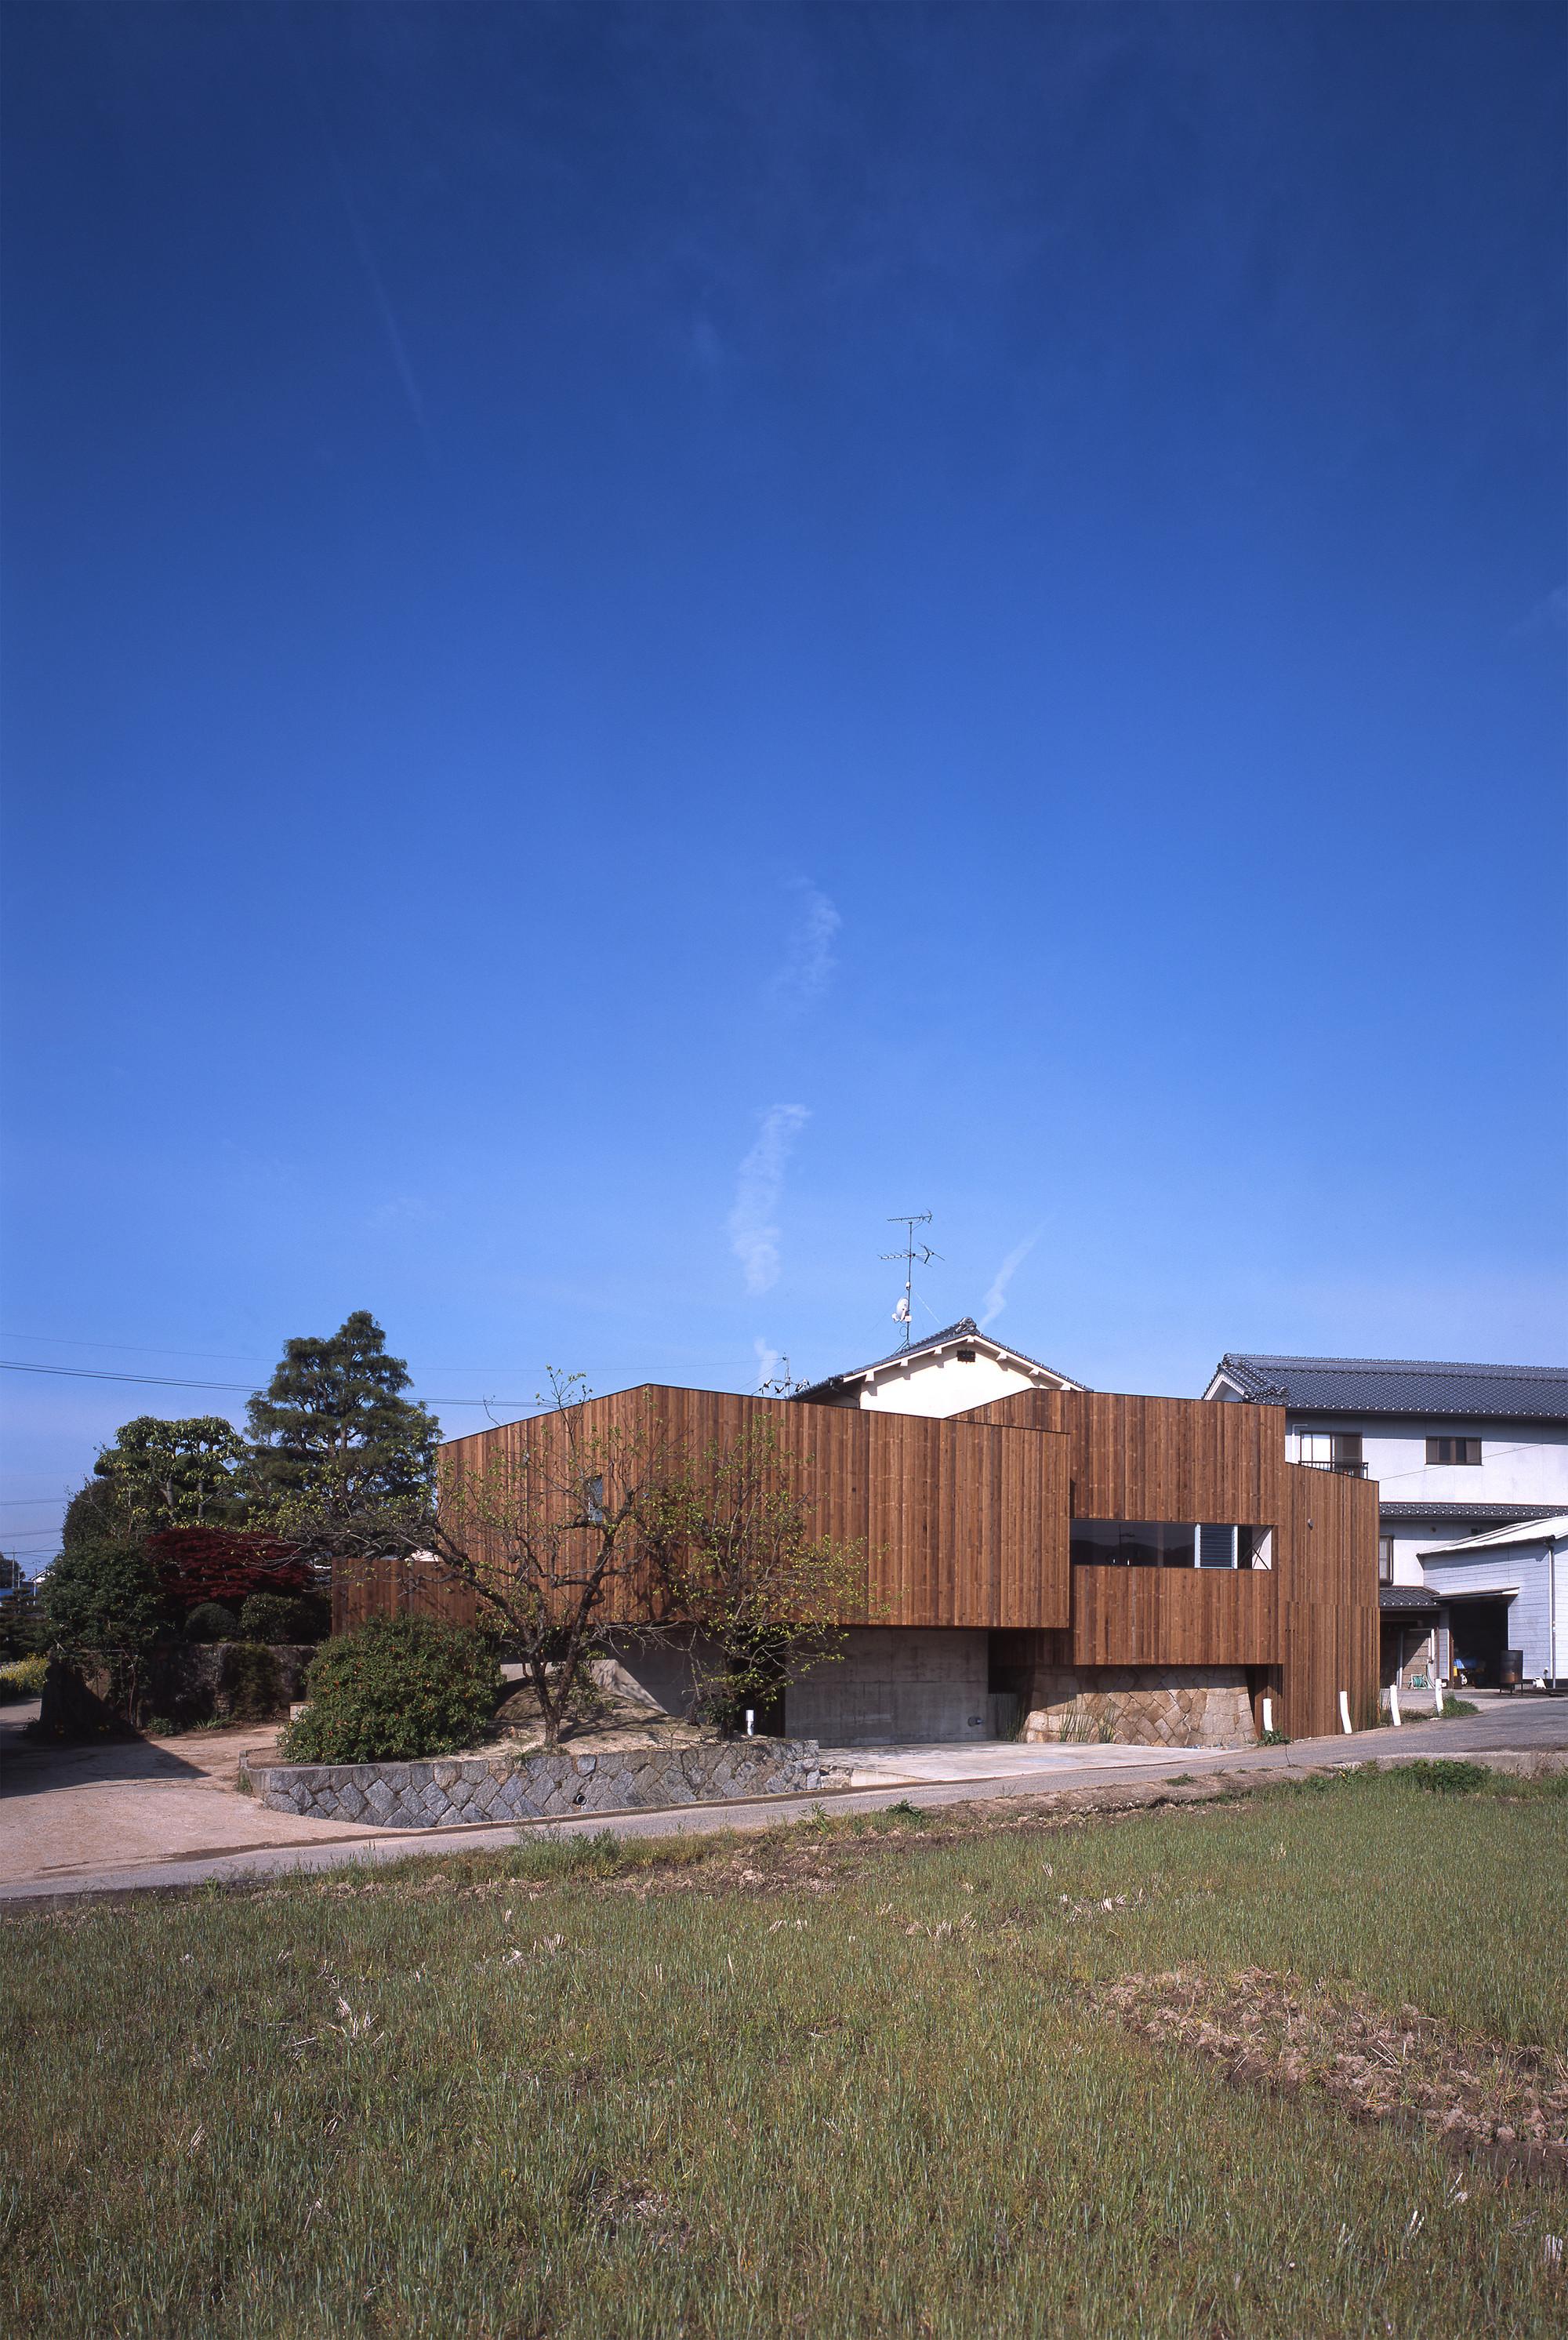 Rustic House / UID Architects, © Hiroshi Ueda